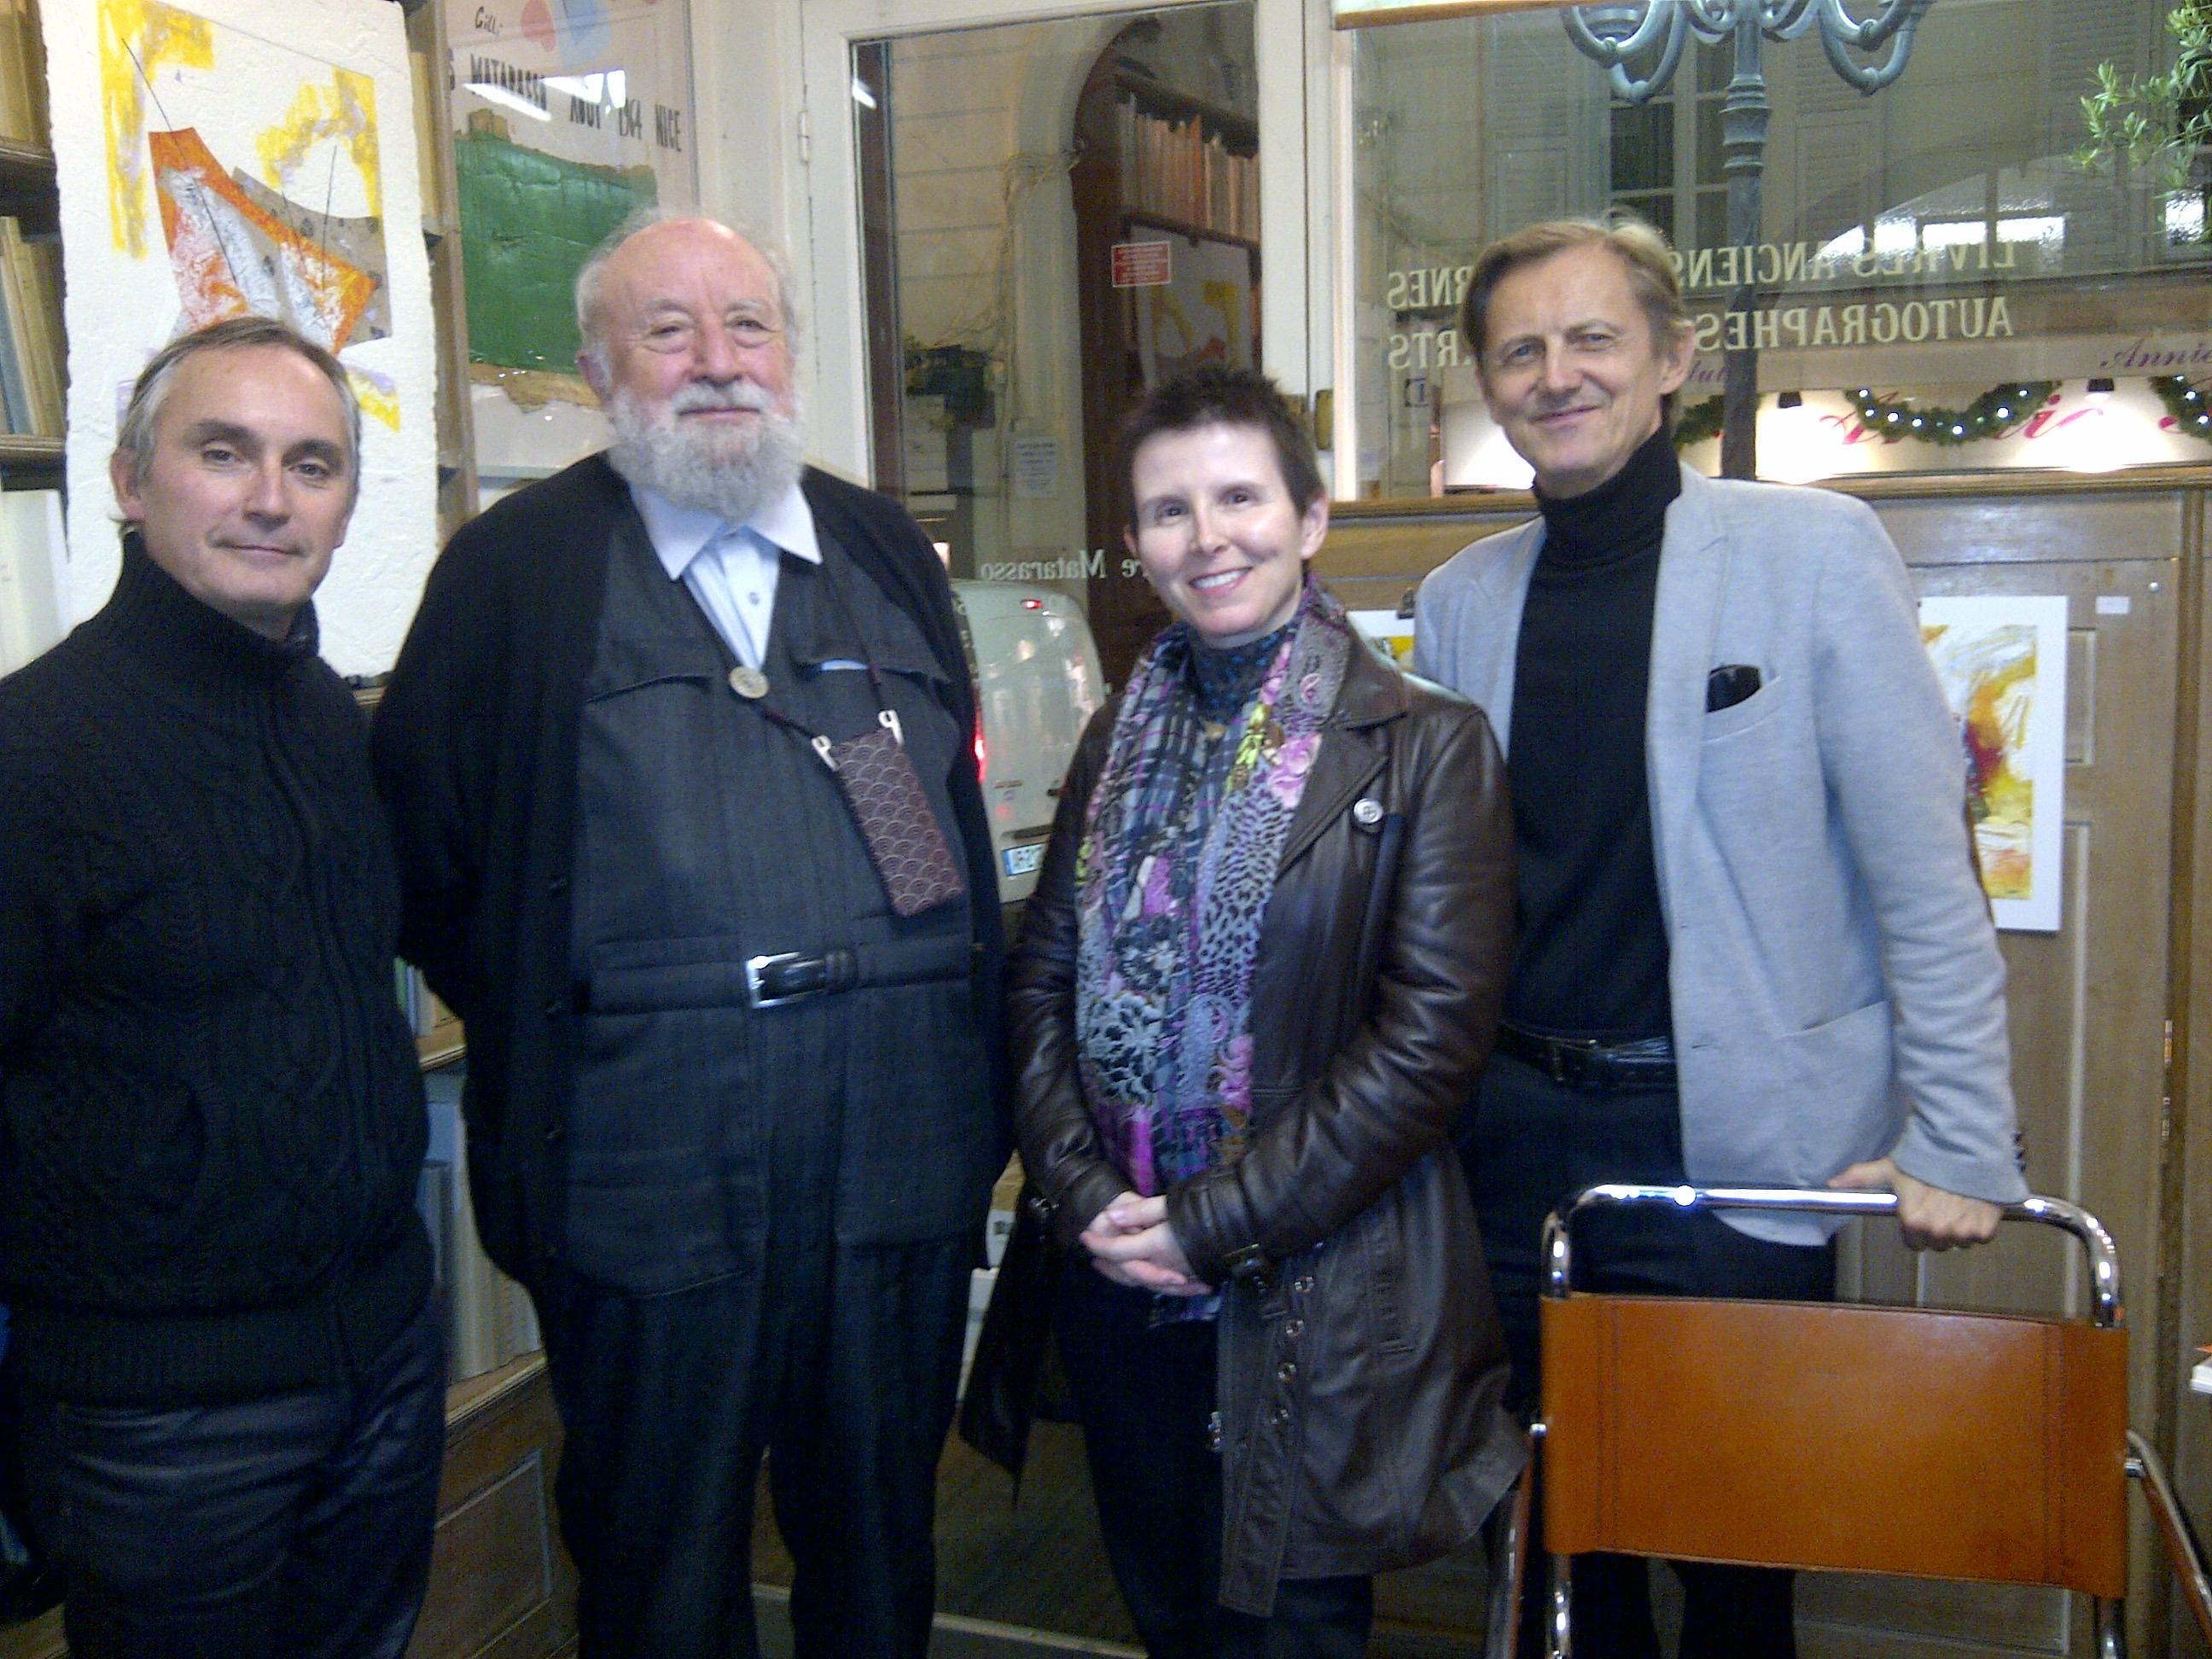 B. Alligand, M. Butor, R. Detambel, S. Palsson